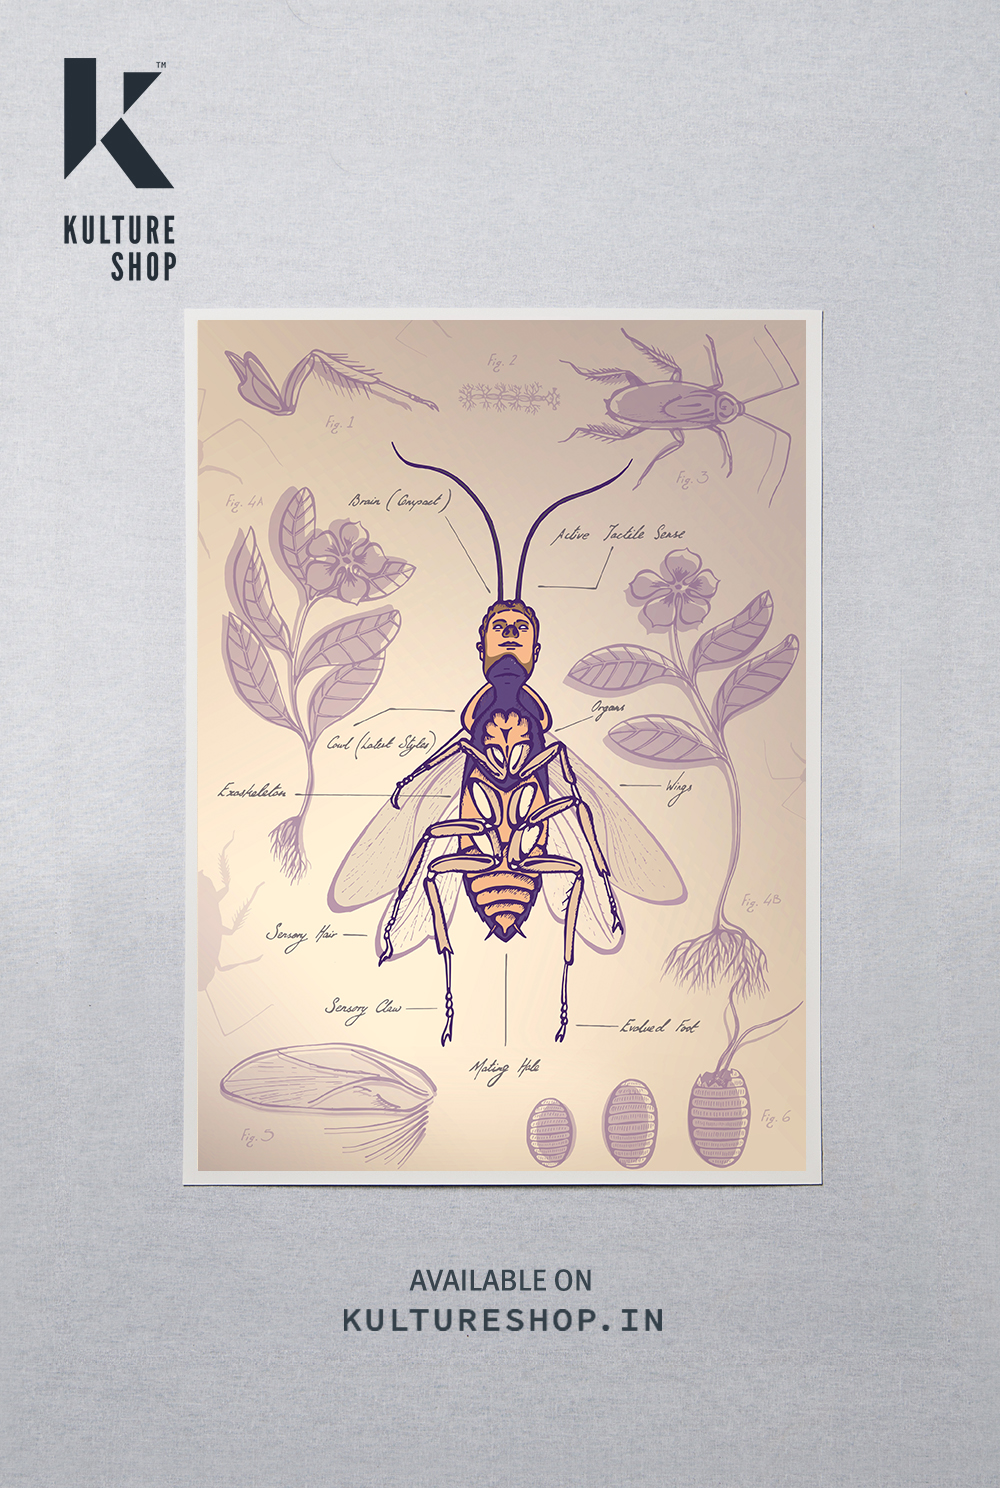 KS_Online-Artprint-RiseoftheRoach-2